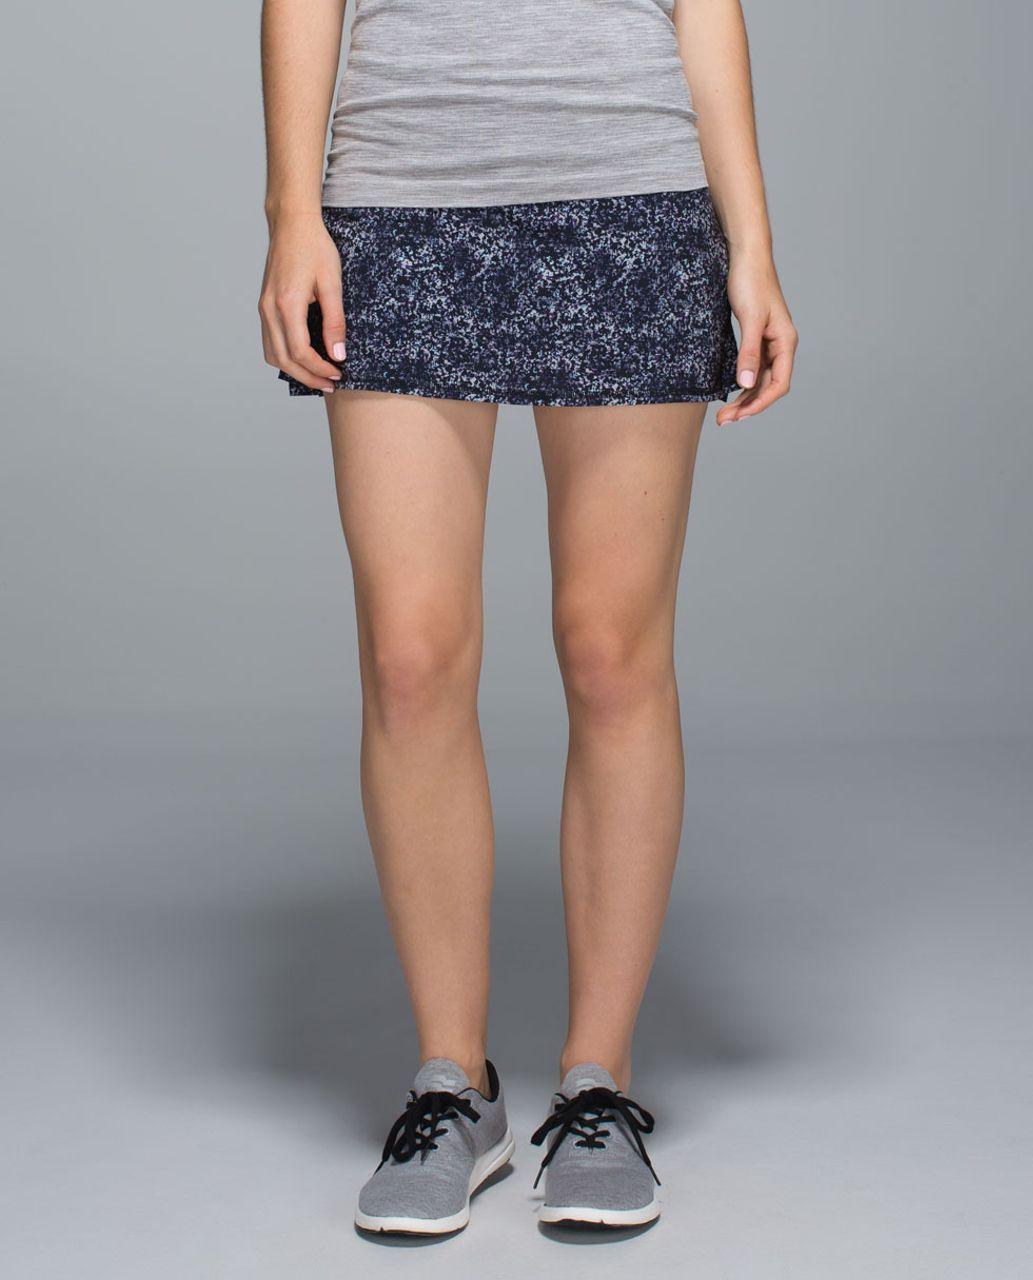 Lululemon Run:  Pace Setter Skirt *4-way Stretch (Regular) - Rocky Road Sand Dune Toothpaste / Black